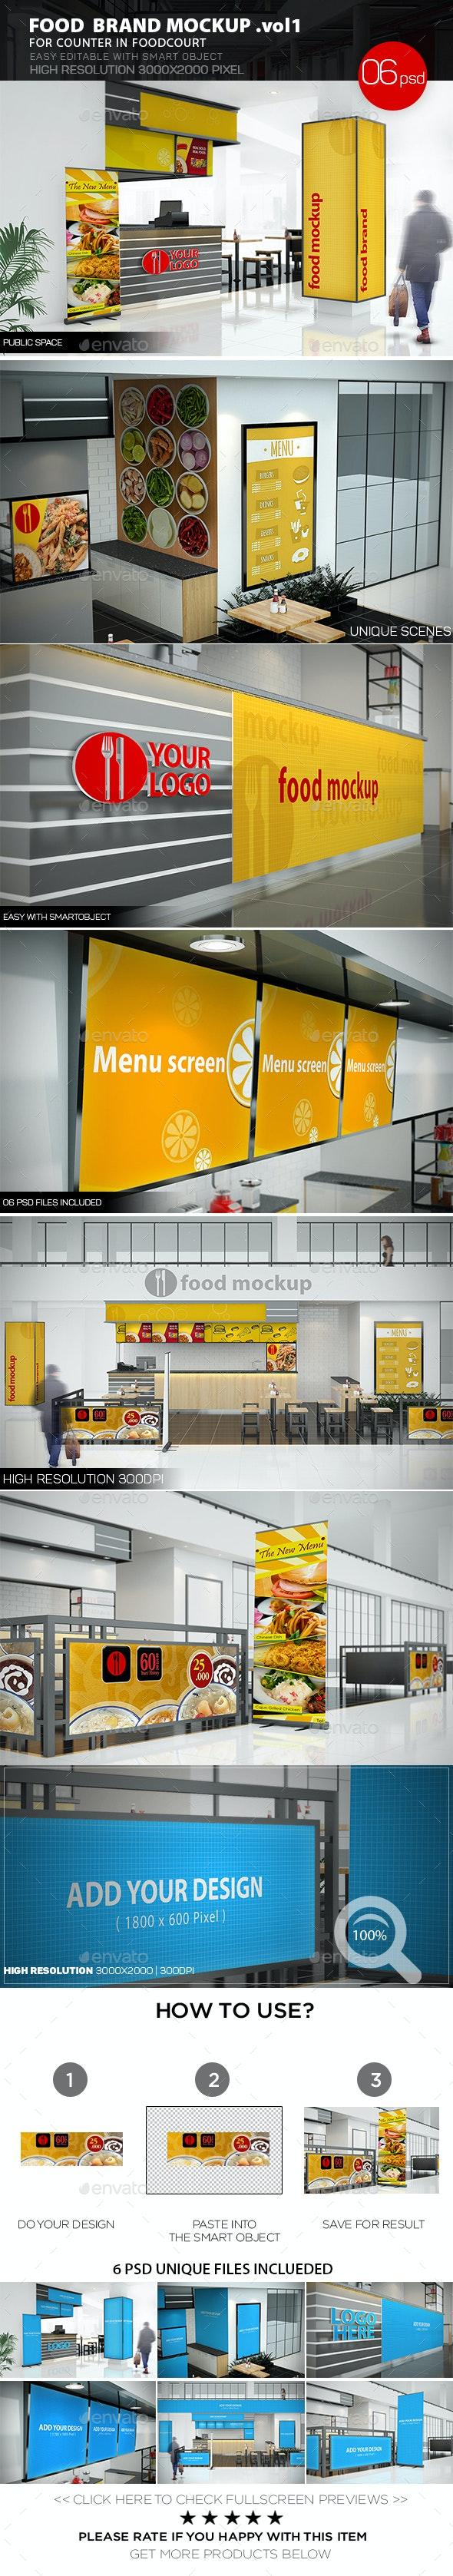 Food Brand Mockup v.1 - Posters Print